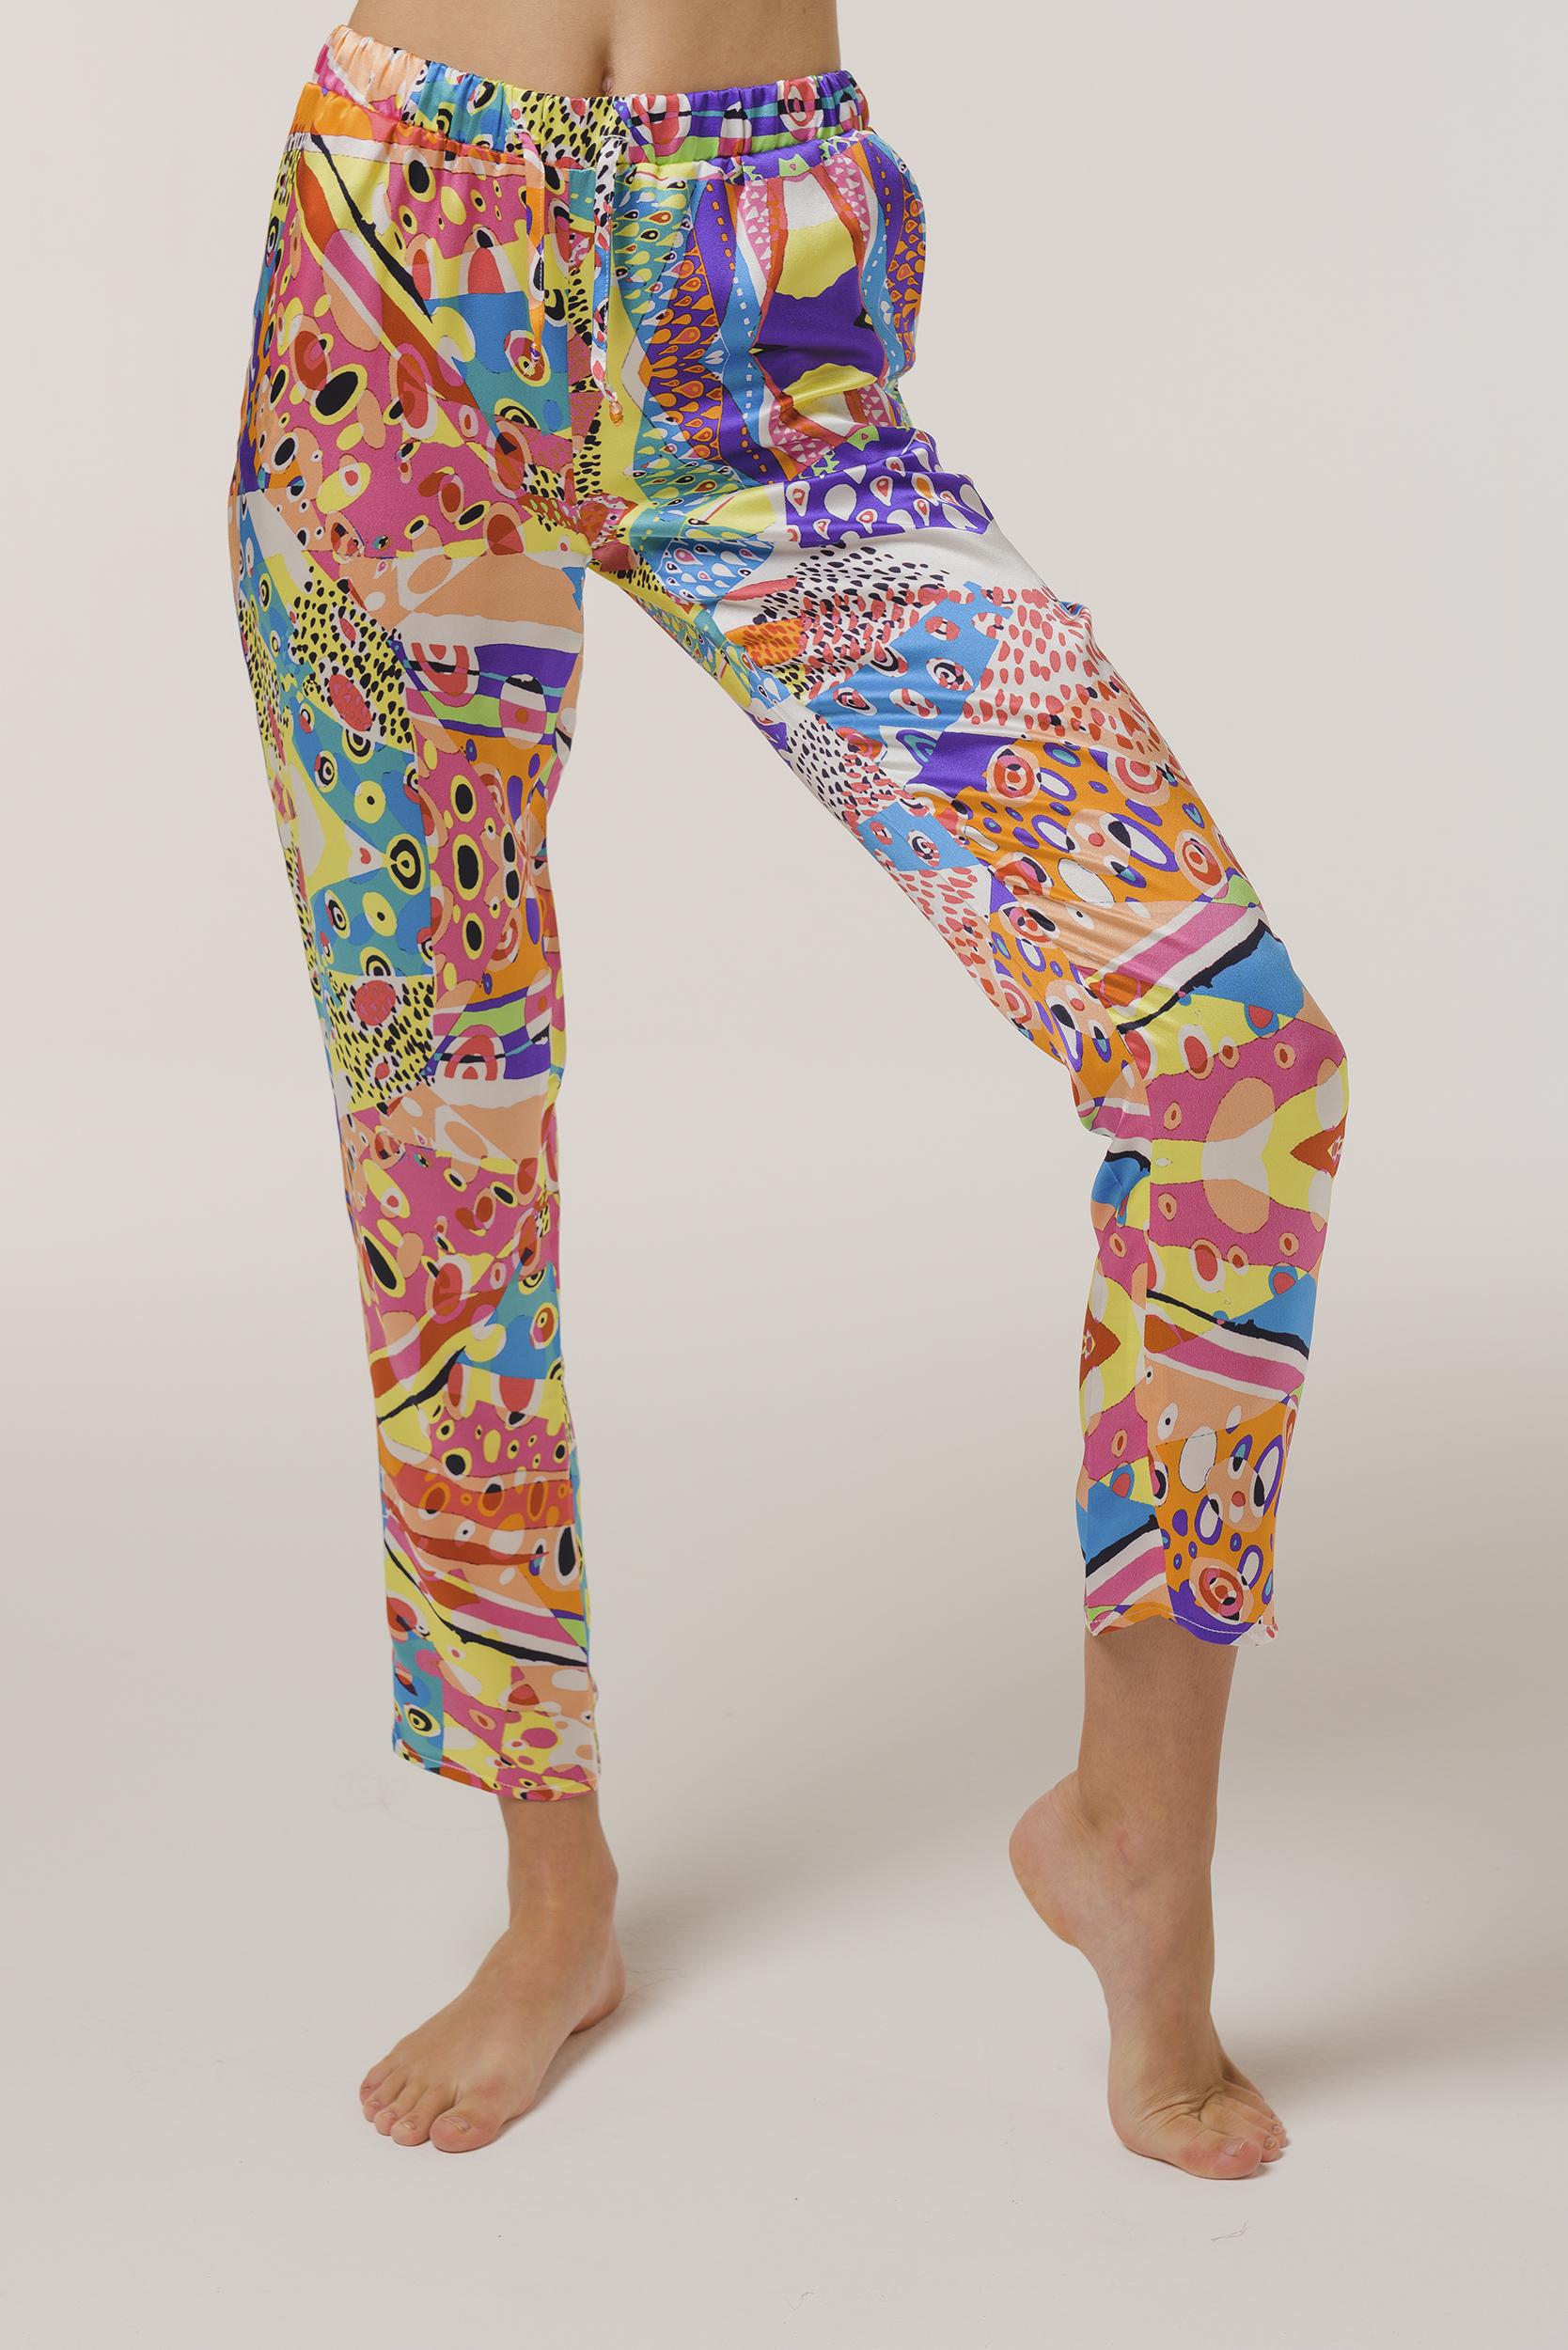 pajamas made in Italy